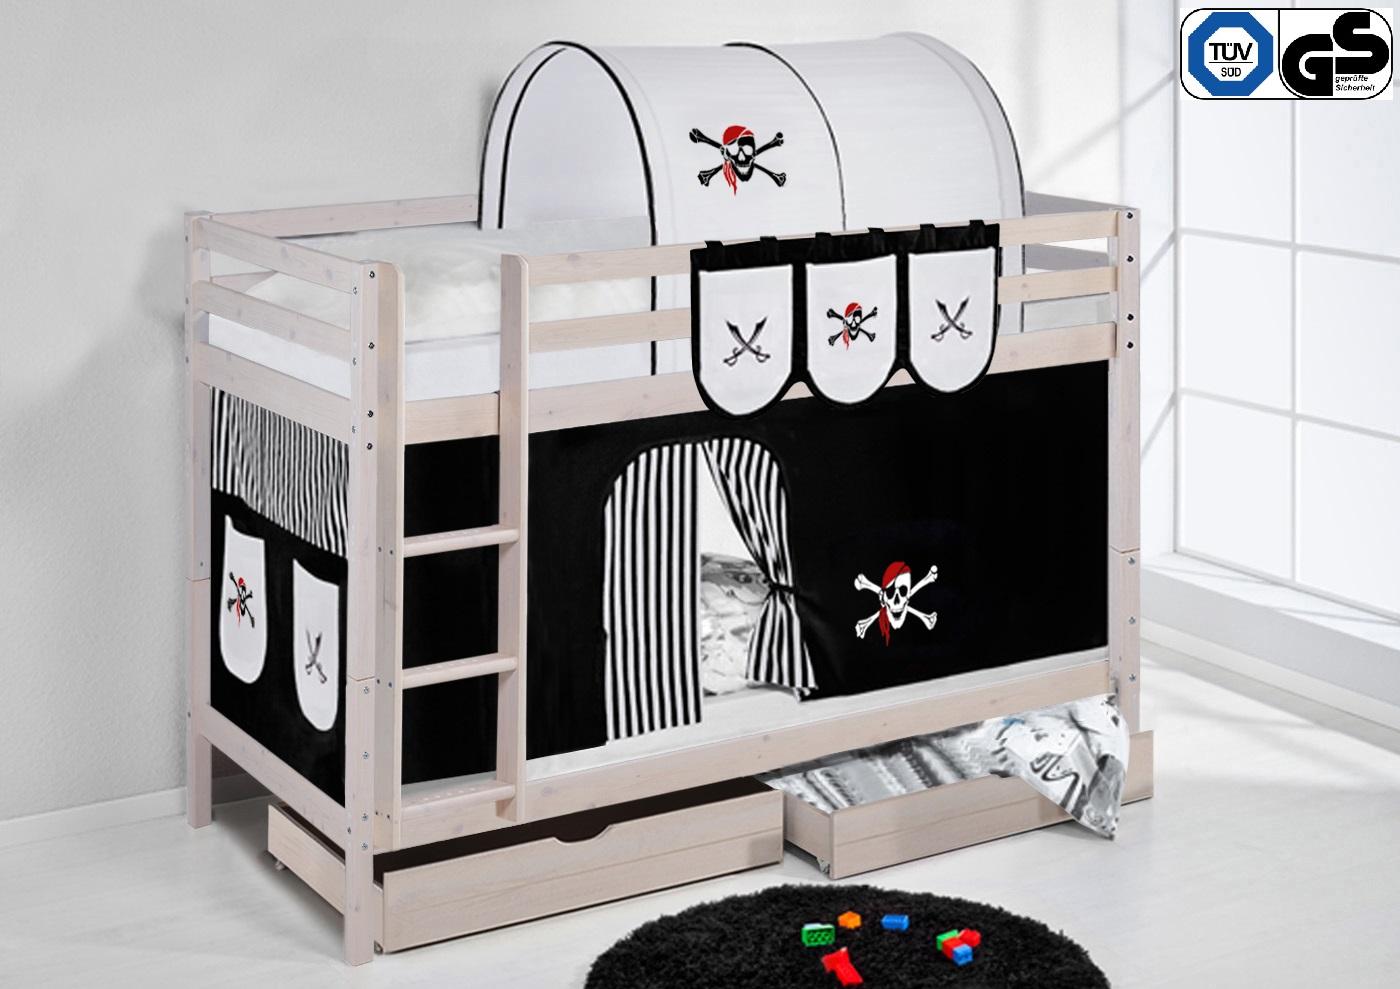 etagenbett hochbett kinder bett aus kiefer nele wei vorhang t v gs gepr ft ebay. Black Bedroom Furniture Sets. Home Design Ideas